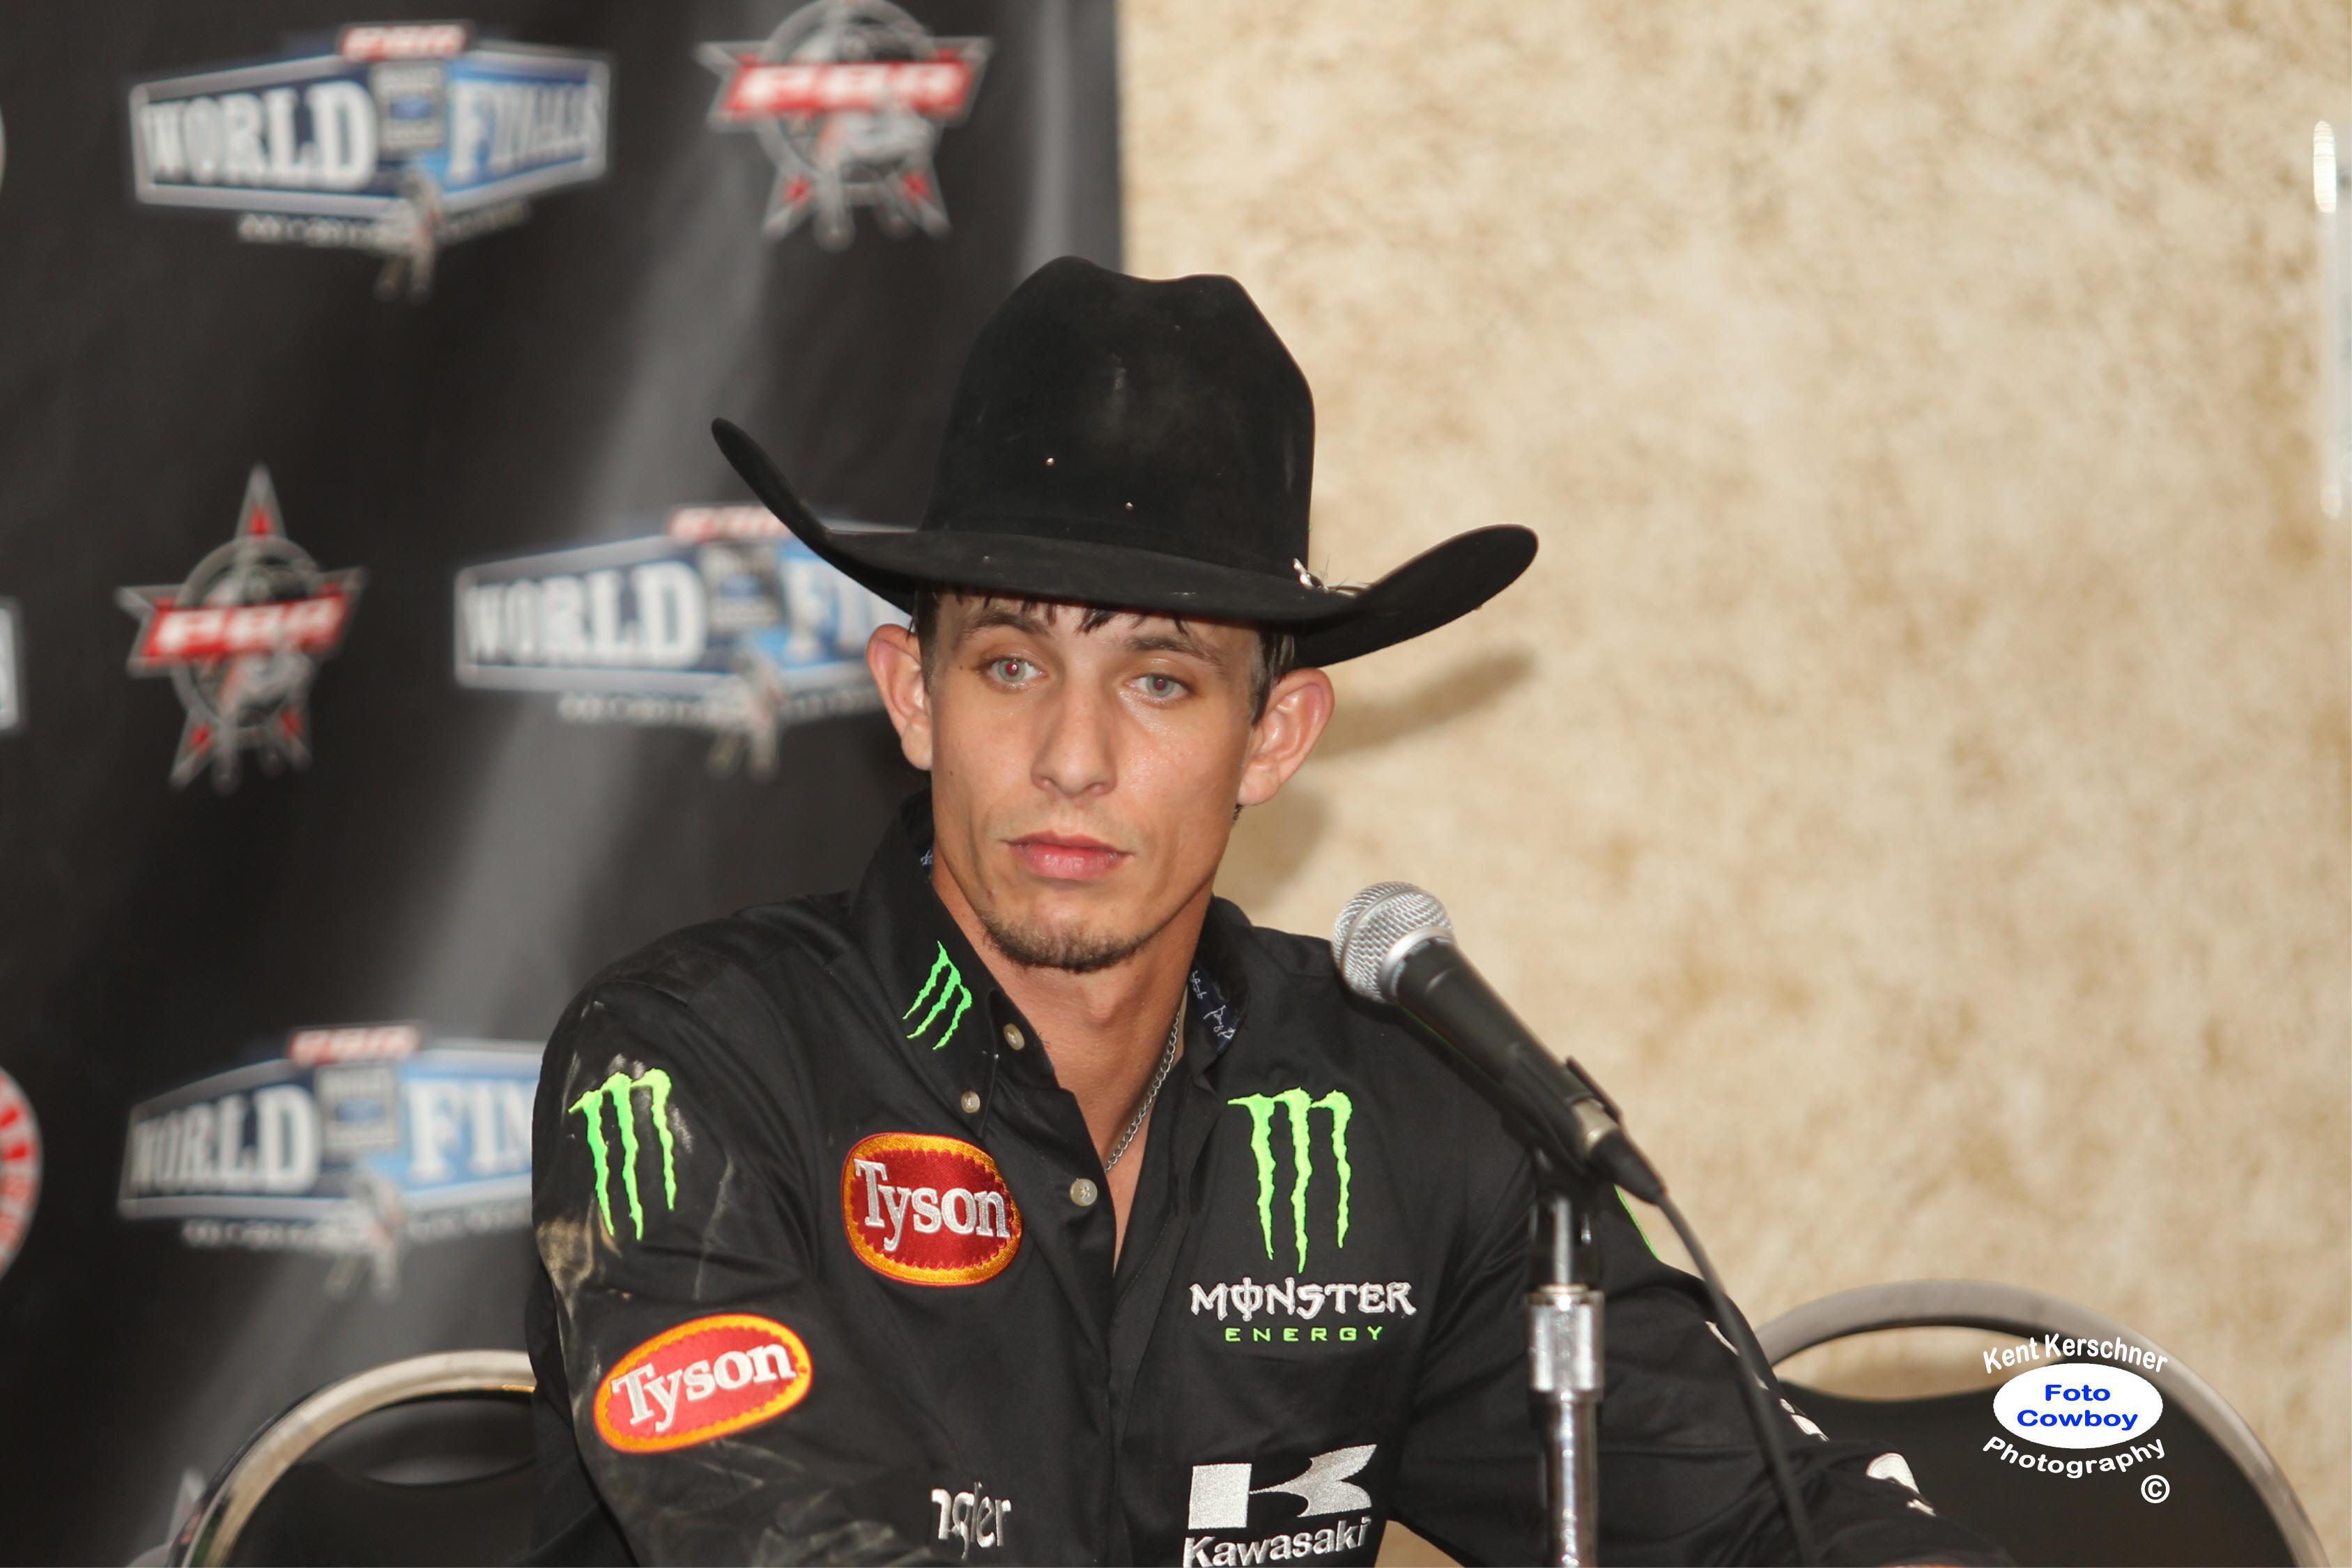 C29I3786 JB Mauney - The Rodeo Round Up b10a86f5804